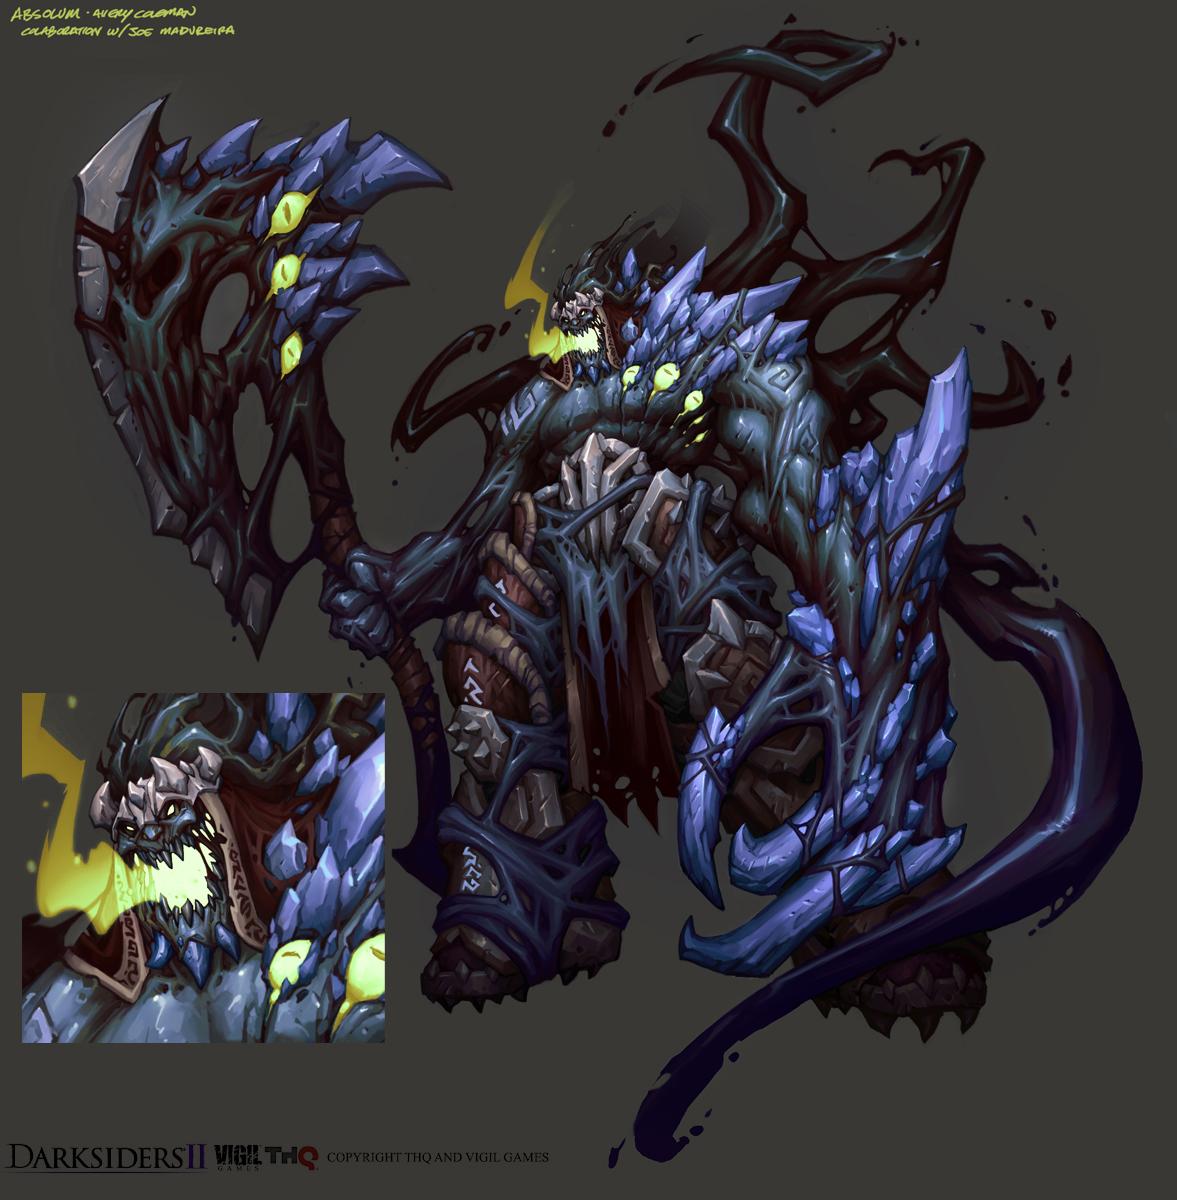 The Lantern Factory: Darksiders 2 Concept Art - The Super DUMP